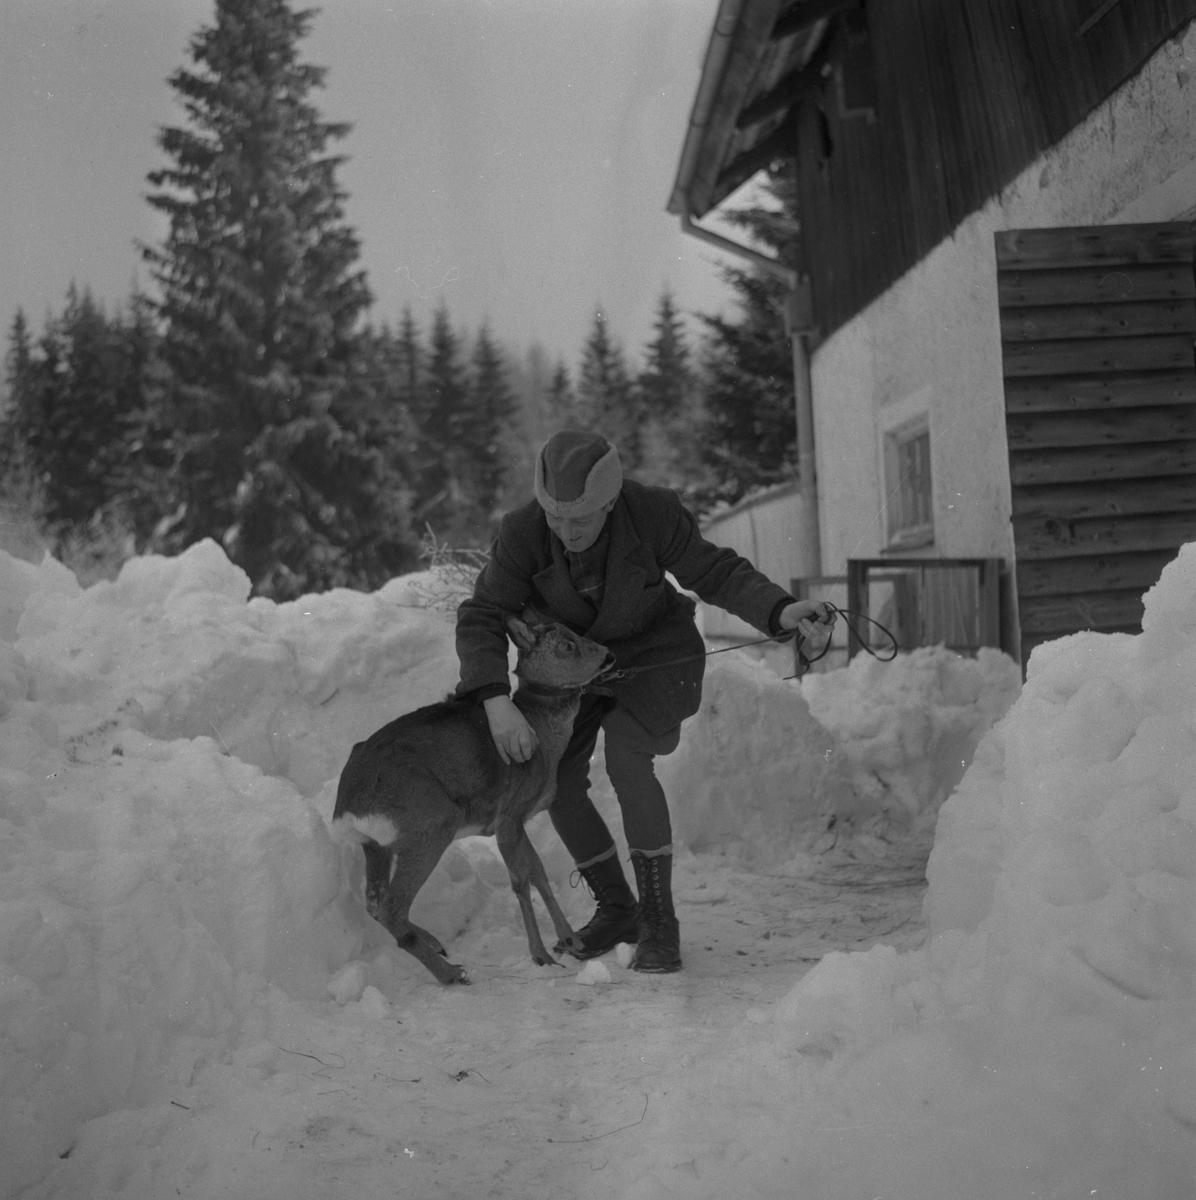 Rådjur i Ramshyttan.  13 februari 1959.